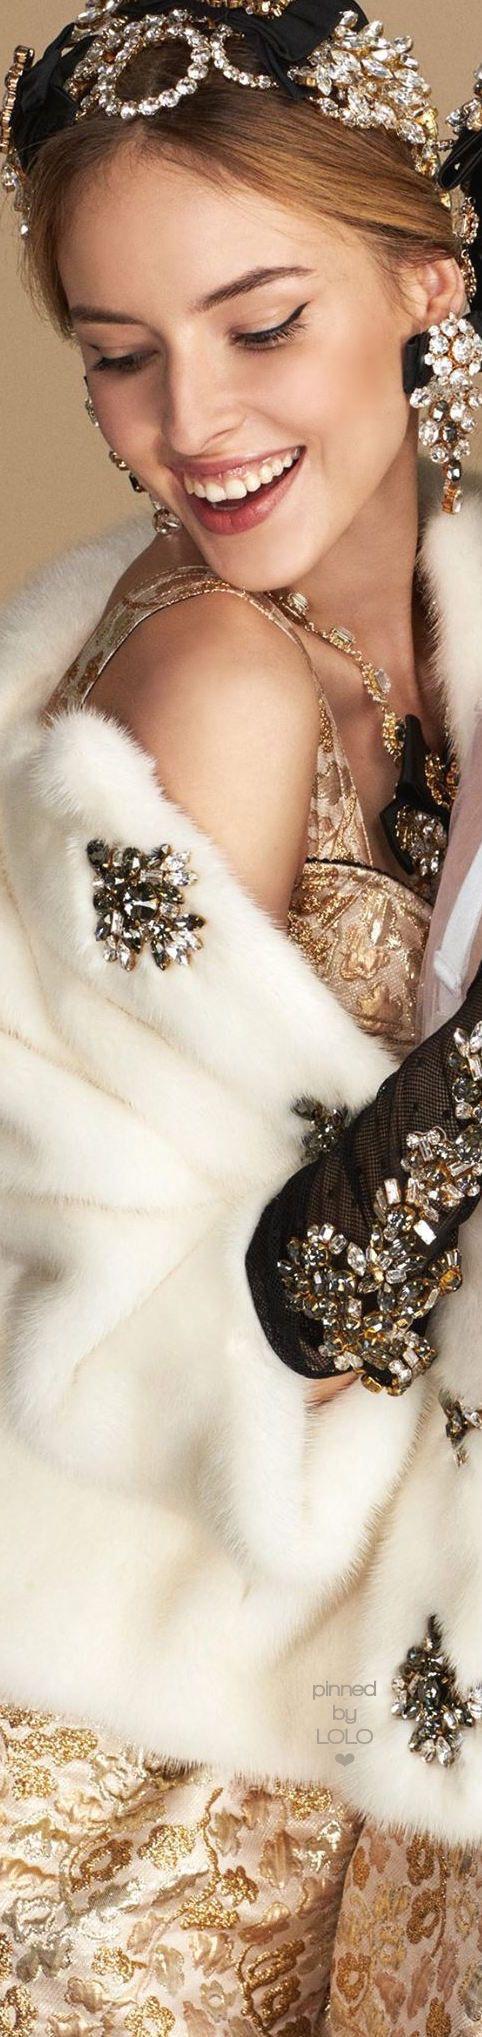 Dolce & Gabbana luxury jewelry #moderndesign #design #luxurydesign exclusive jewelry, expensive brands, inspiration . Visit www.memoir.pt